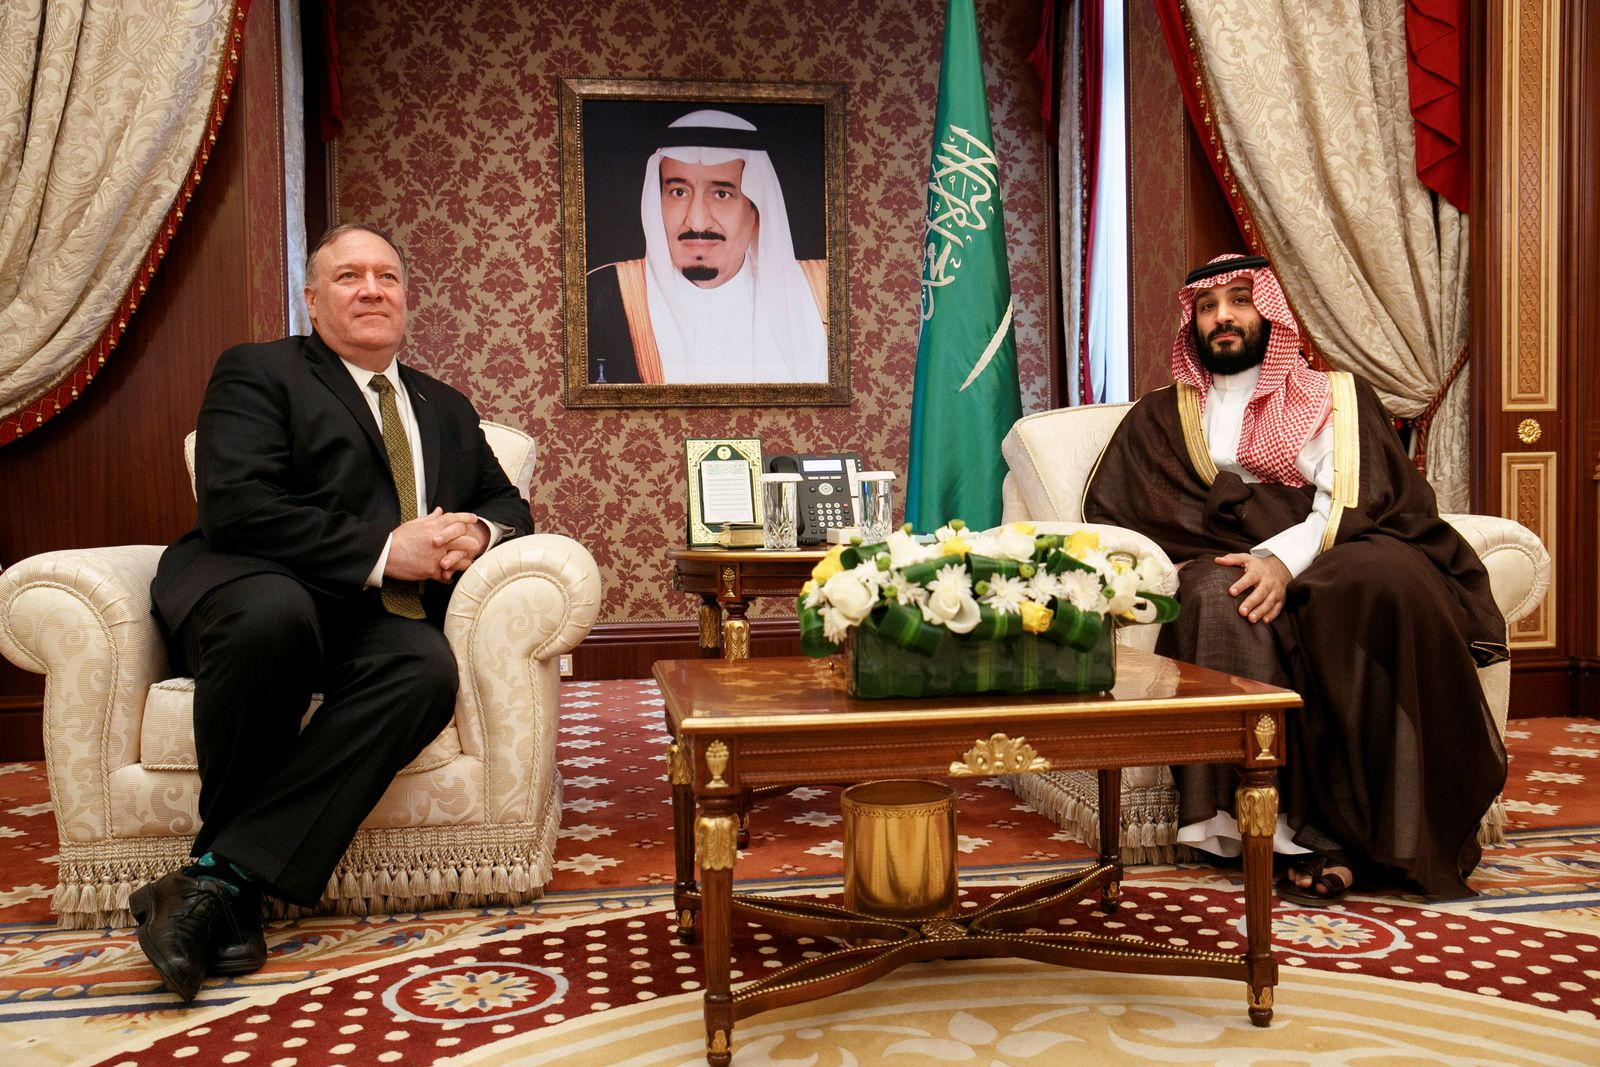 U.S. Secretary of State Pompeo visits Jeddah